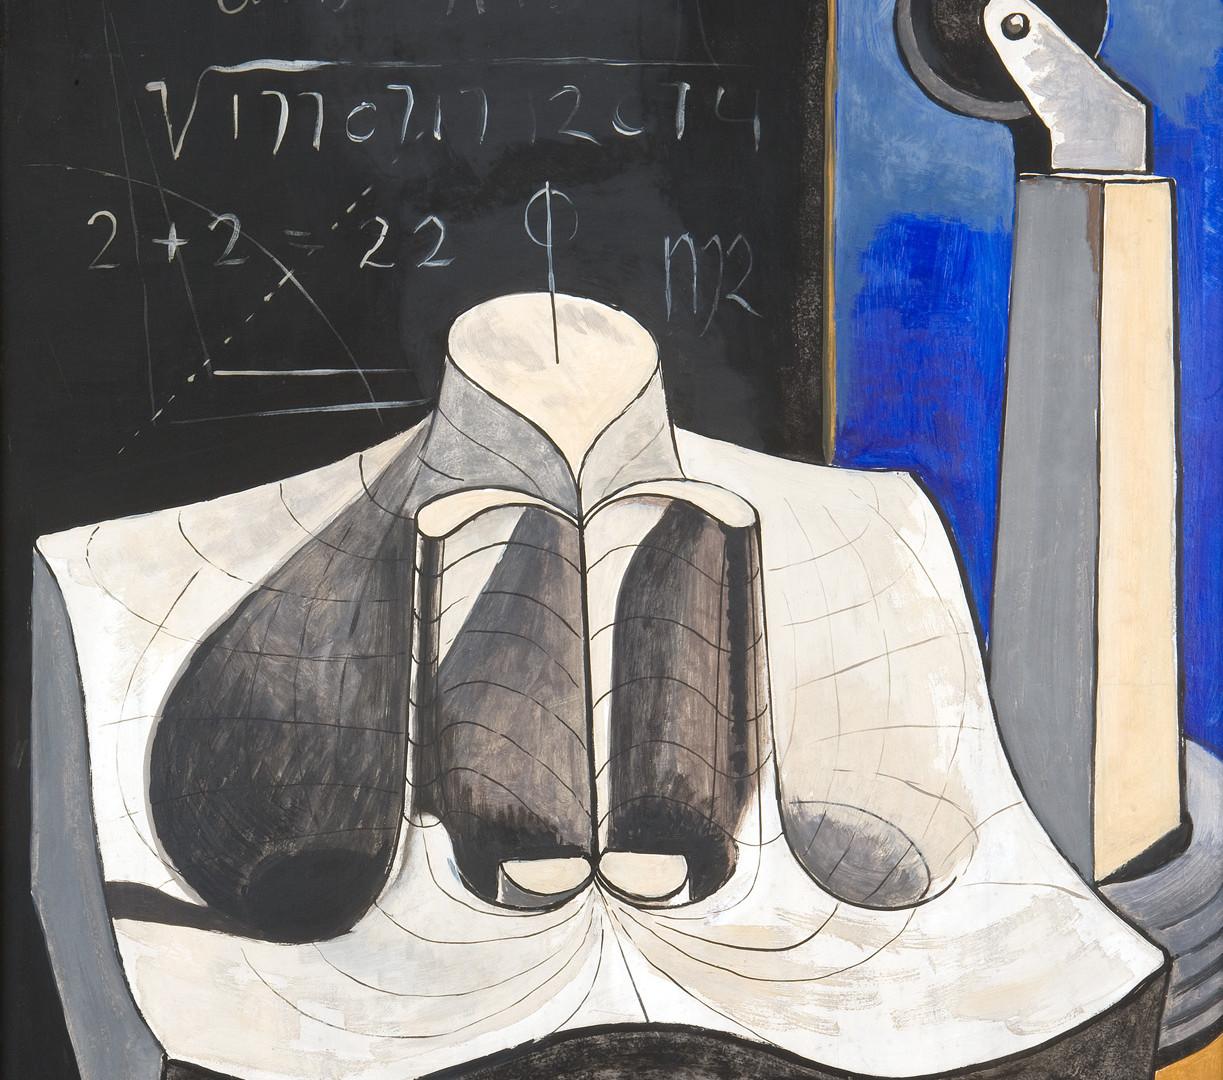 Man Ray (American, 1890-1976), Shakespearean Equations: Julius Caesar, 1948